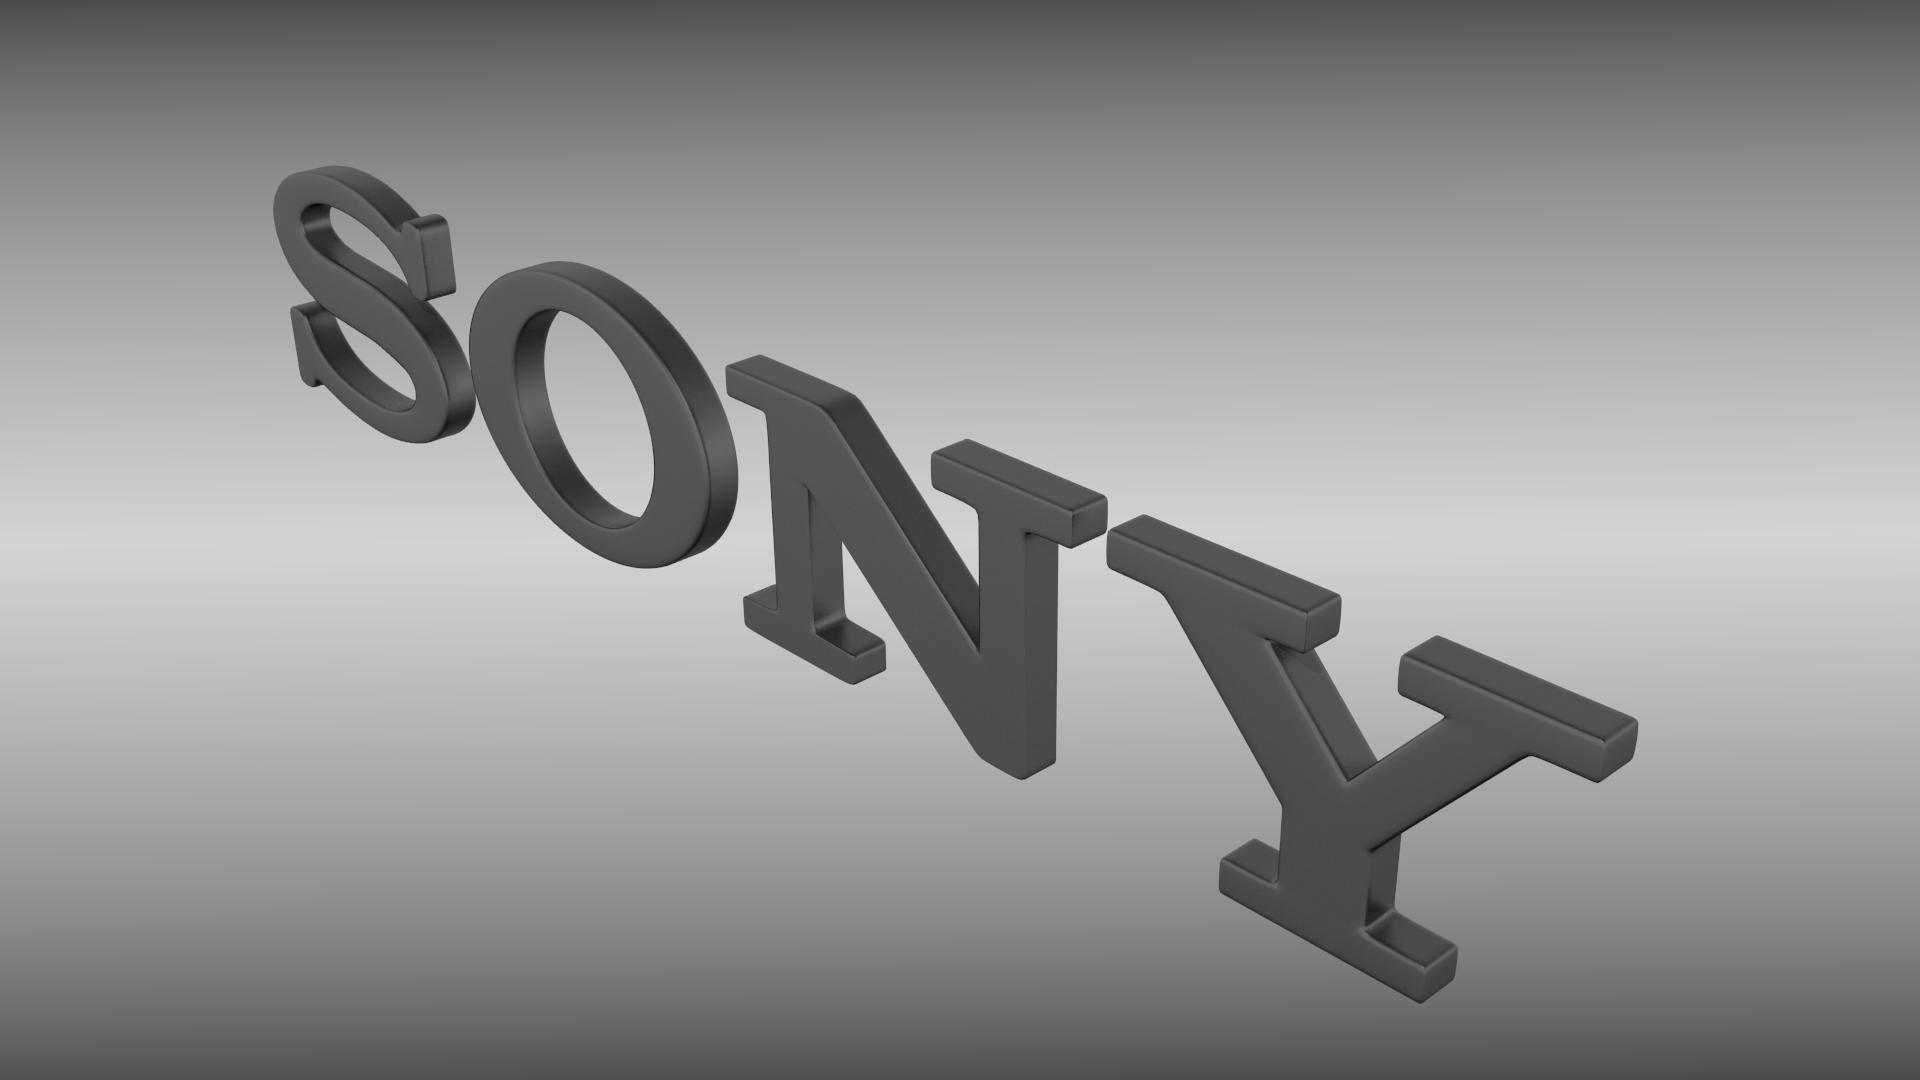 Sony logo free 3d model obj 3ds fbx blend dae - Sony bravia logo hd ...